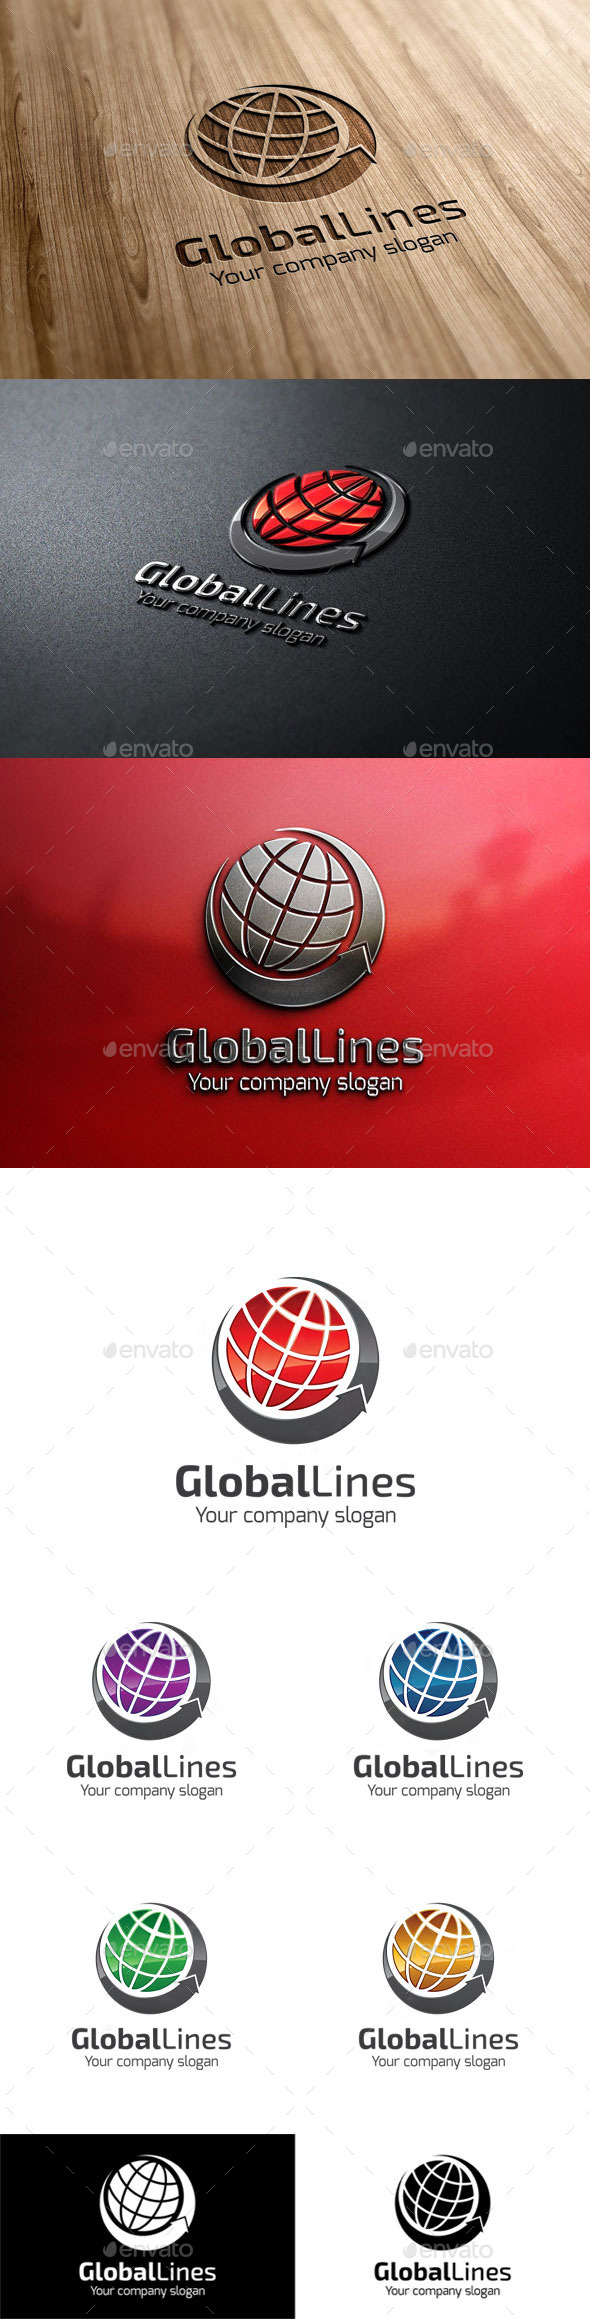 GraphicRiver GlobalLines 11037858